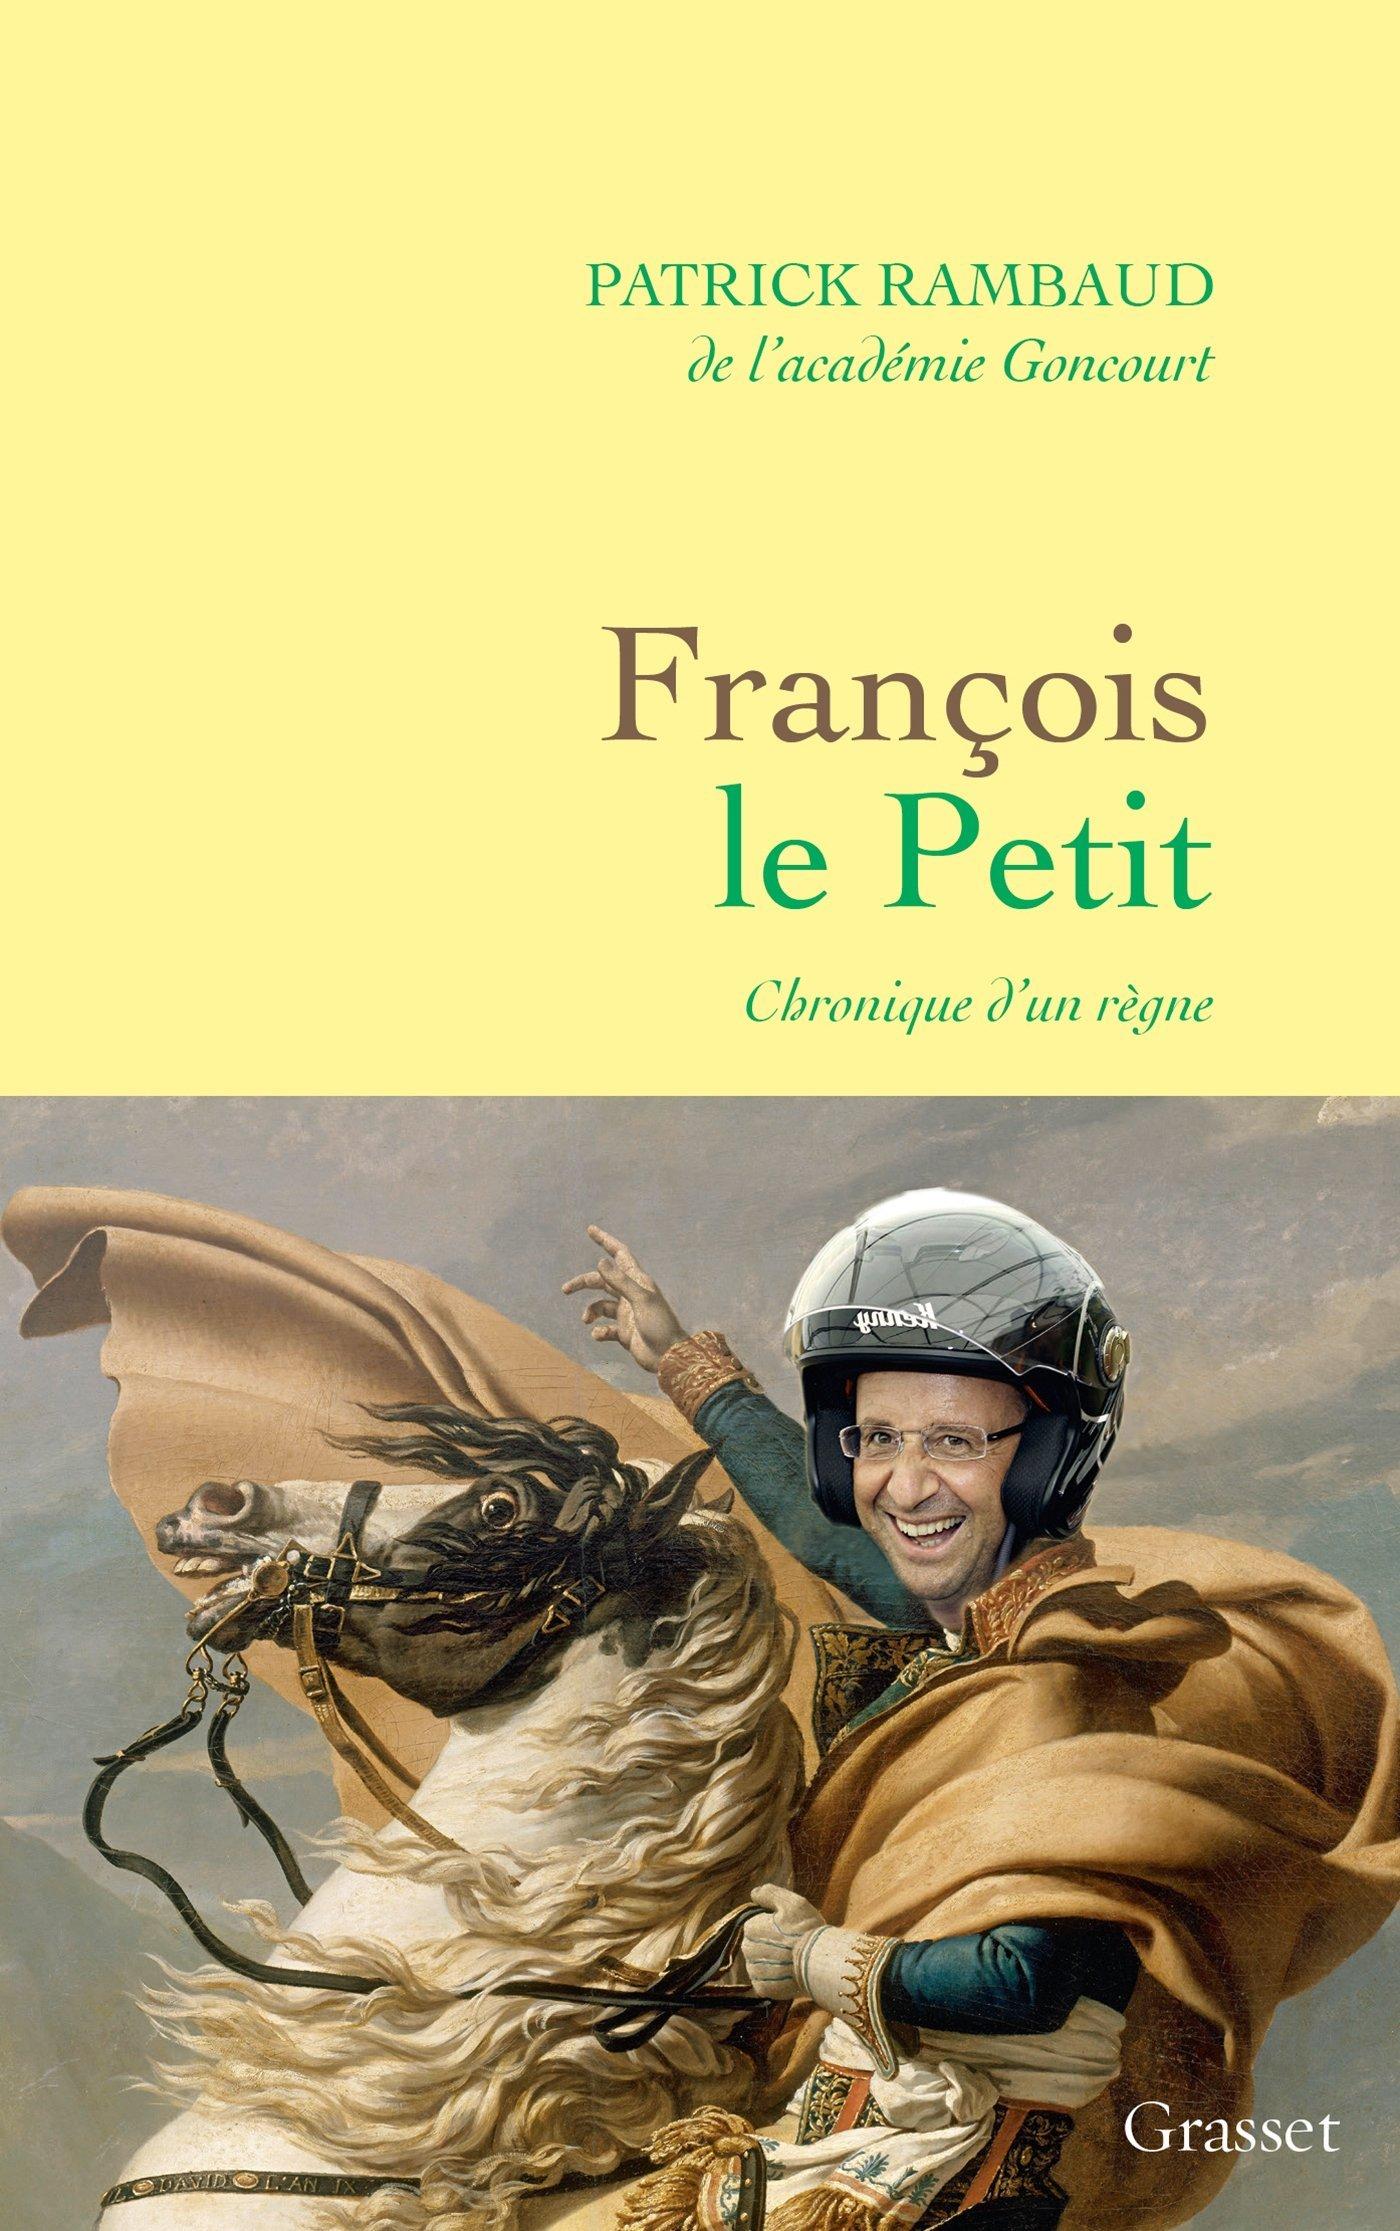 François le Petit Patrick Rambaud